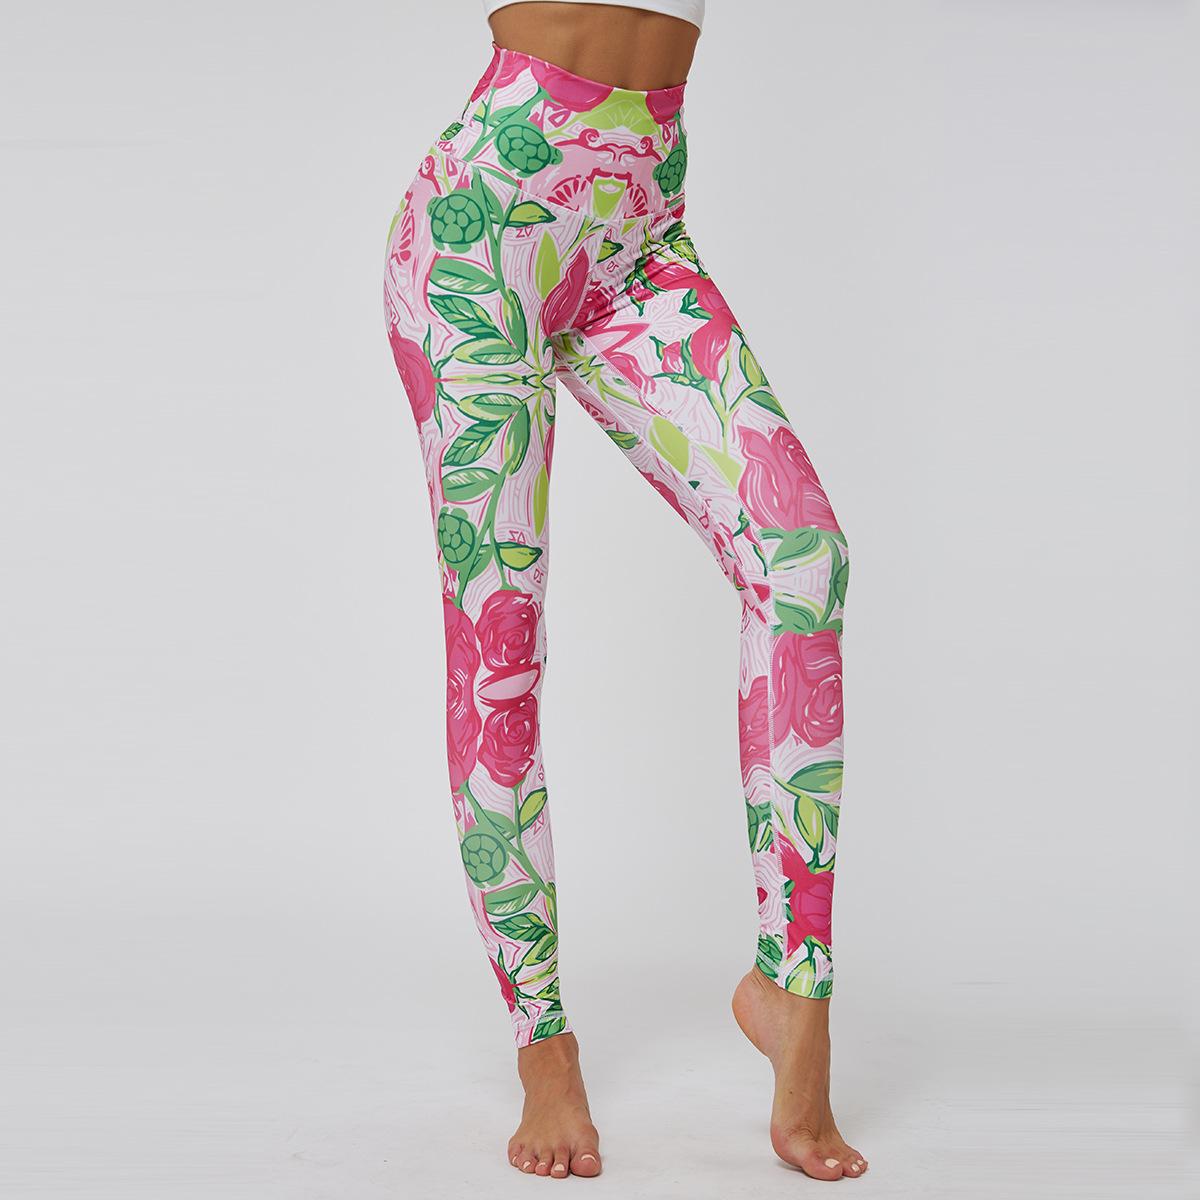 Fashion high waist sports yoga pants printed slim breathable leggings NHMA155846